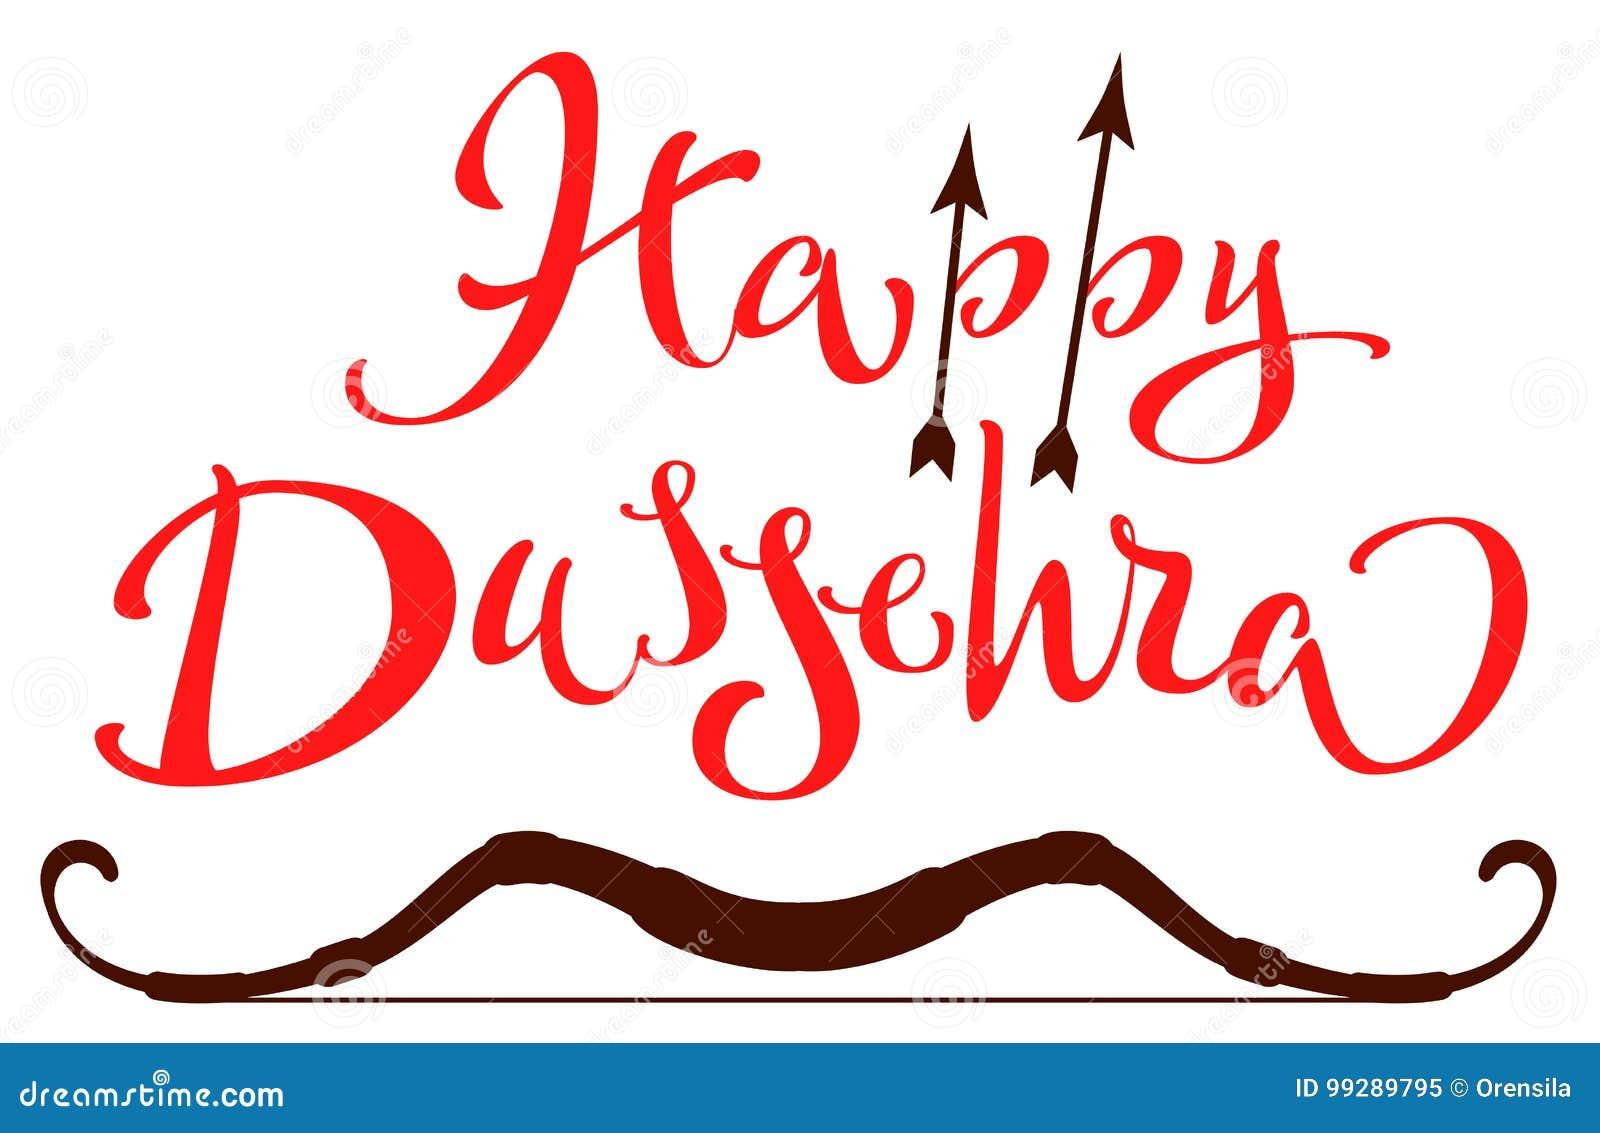 Vijaya dashami dussehra hindu festival happy dussehra lettering vijaya dashami dussehra hindu festival happy dussehra lettering text for greeting card kristyandbryce Images